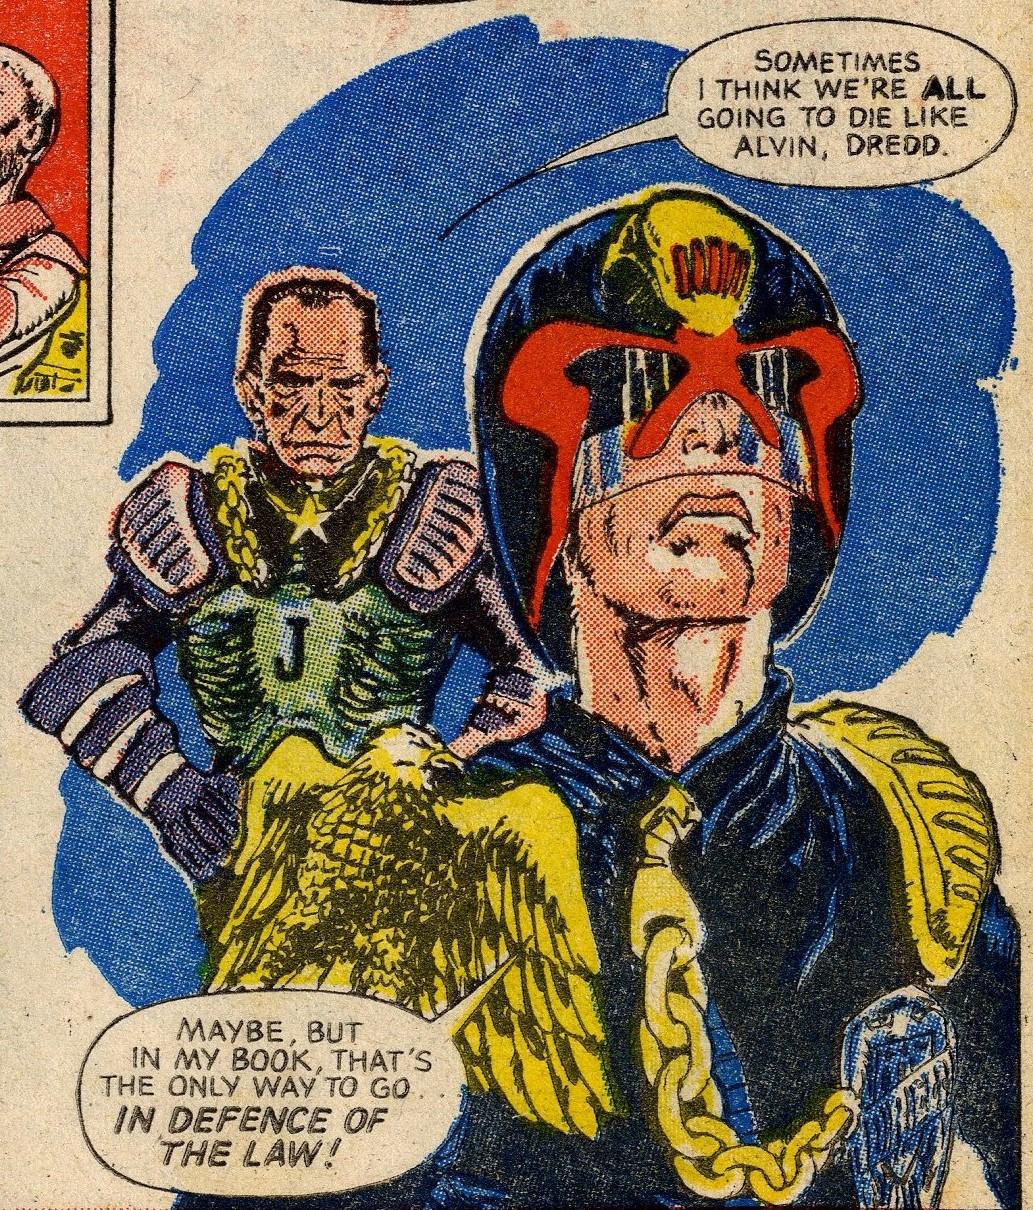 Judge Dredd: Peter Harris (writer), Mike McMahon (artist)